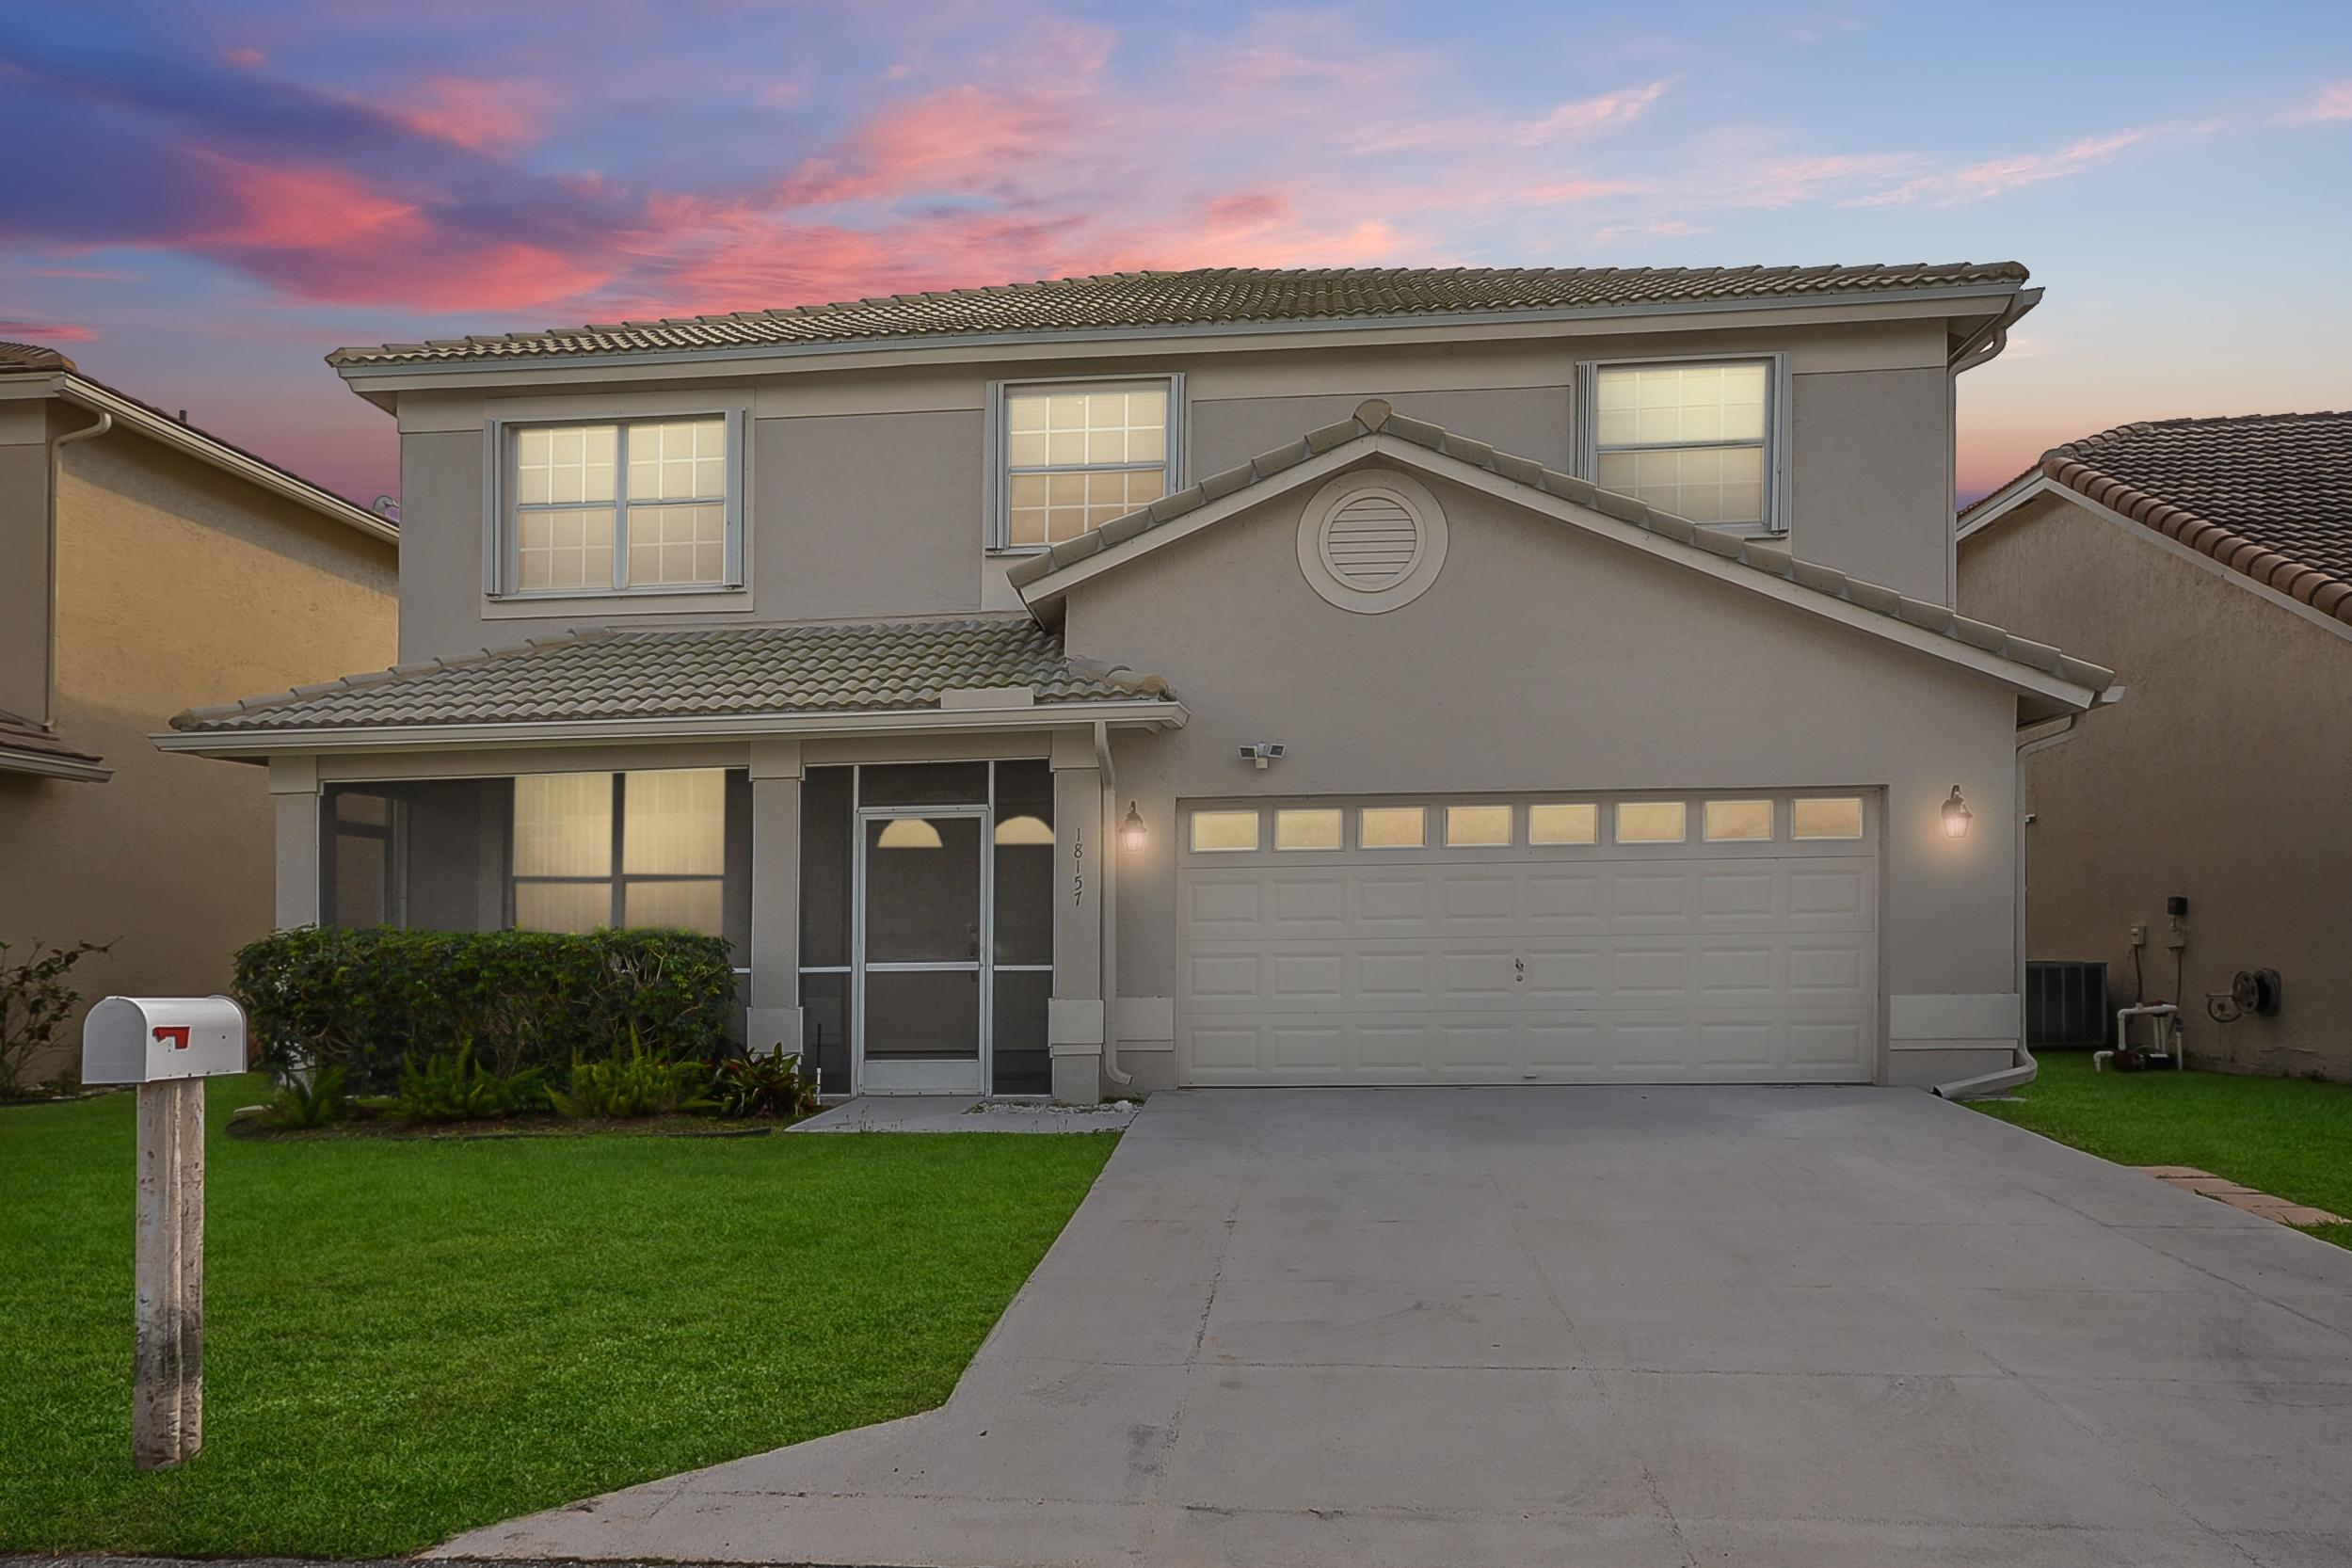 18157 Clear Brook Circle, Boca Raton, FL 33498 MLS# RX-10509503